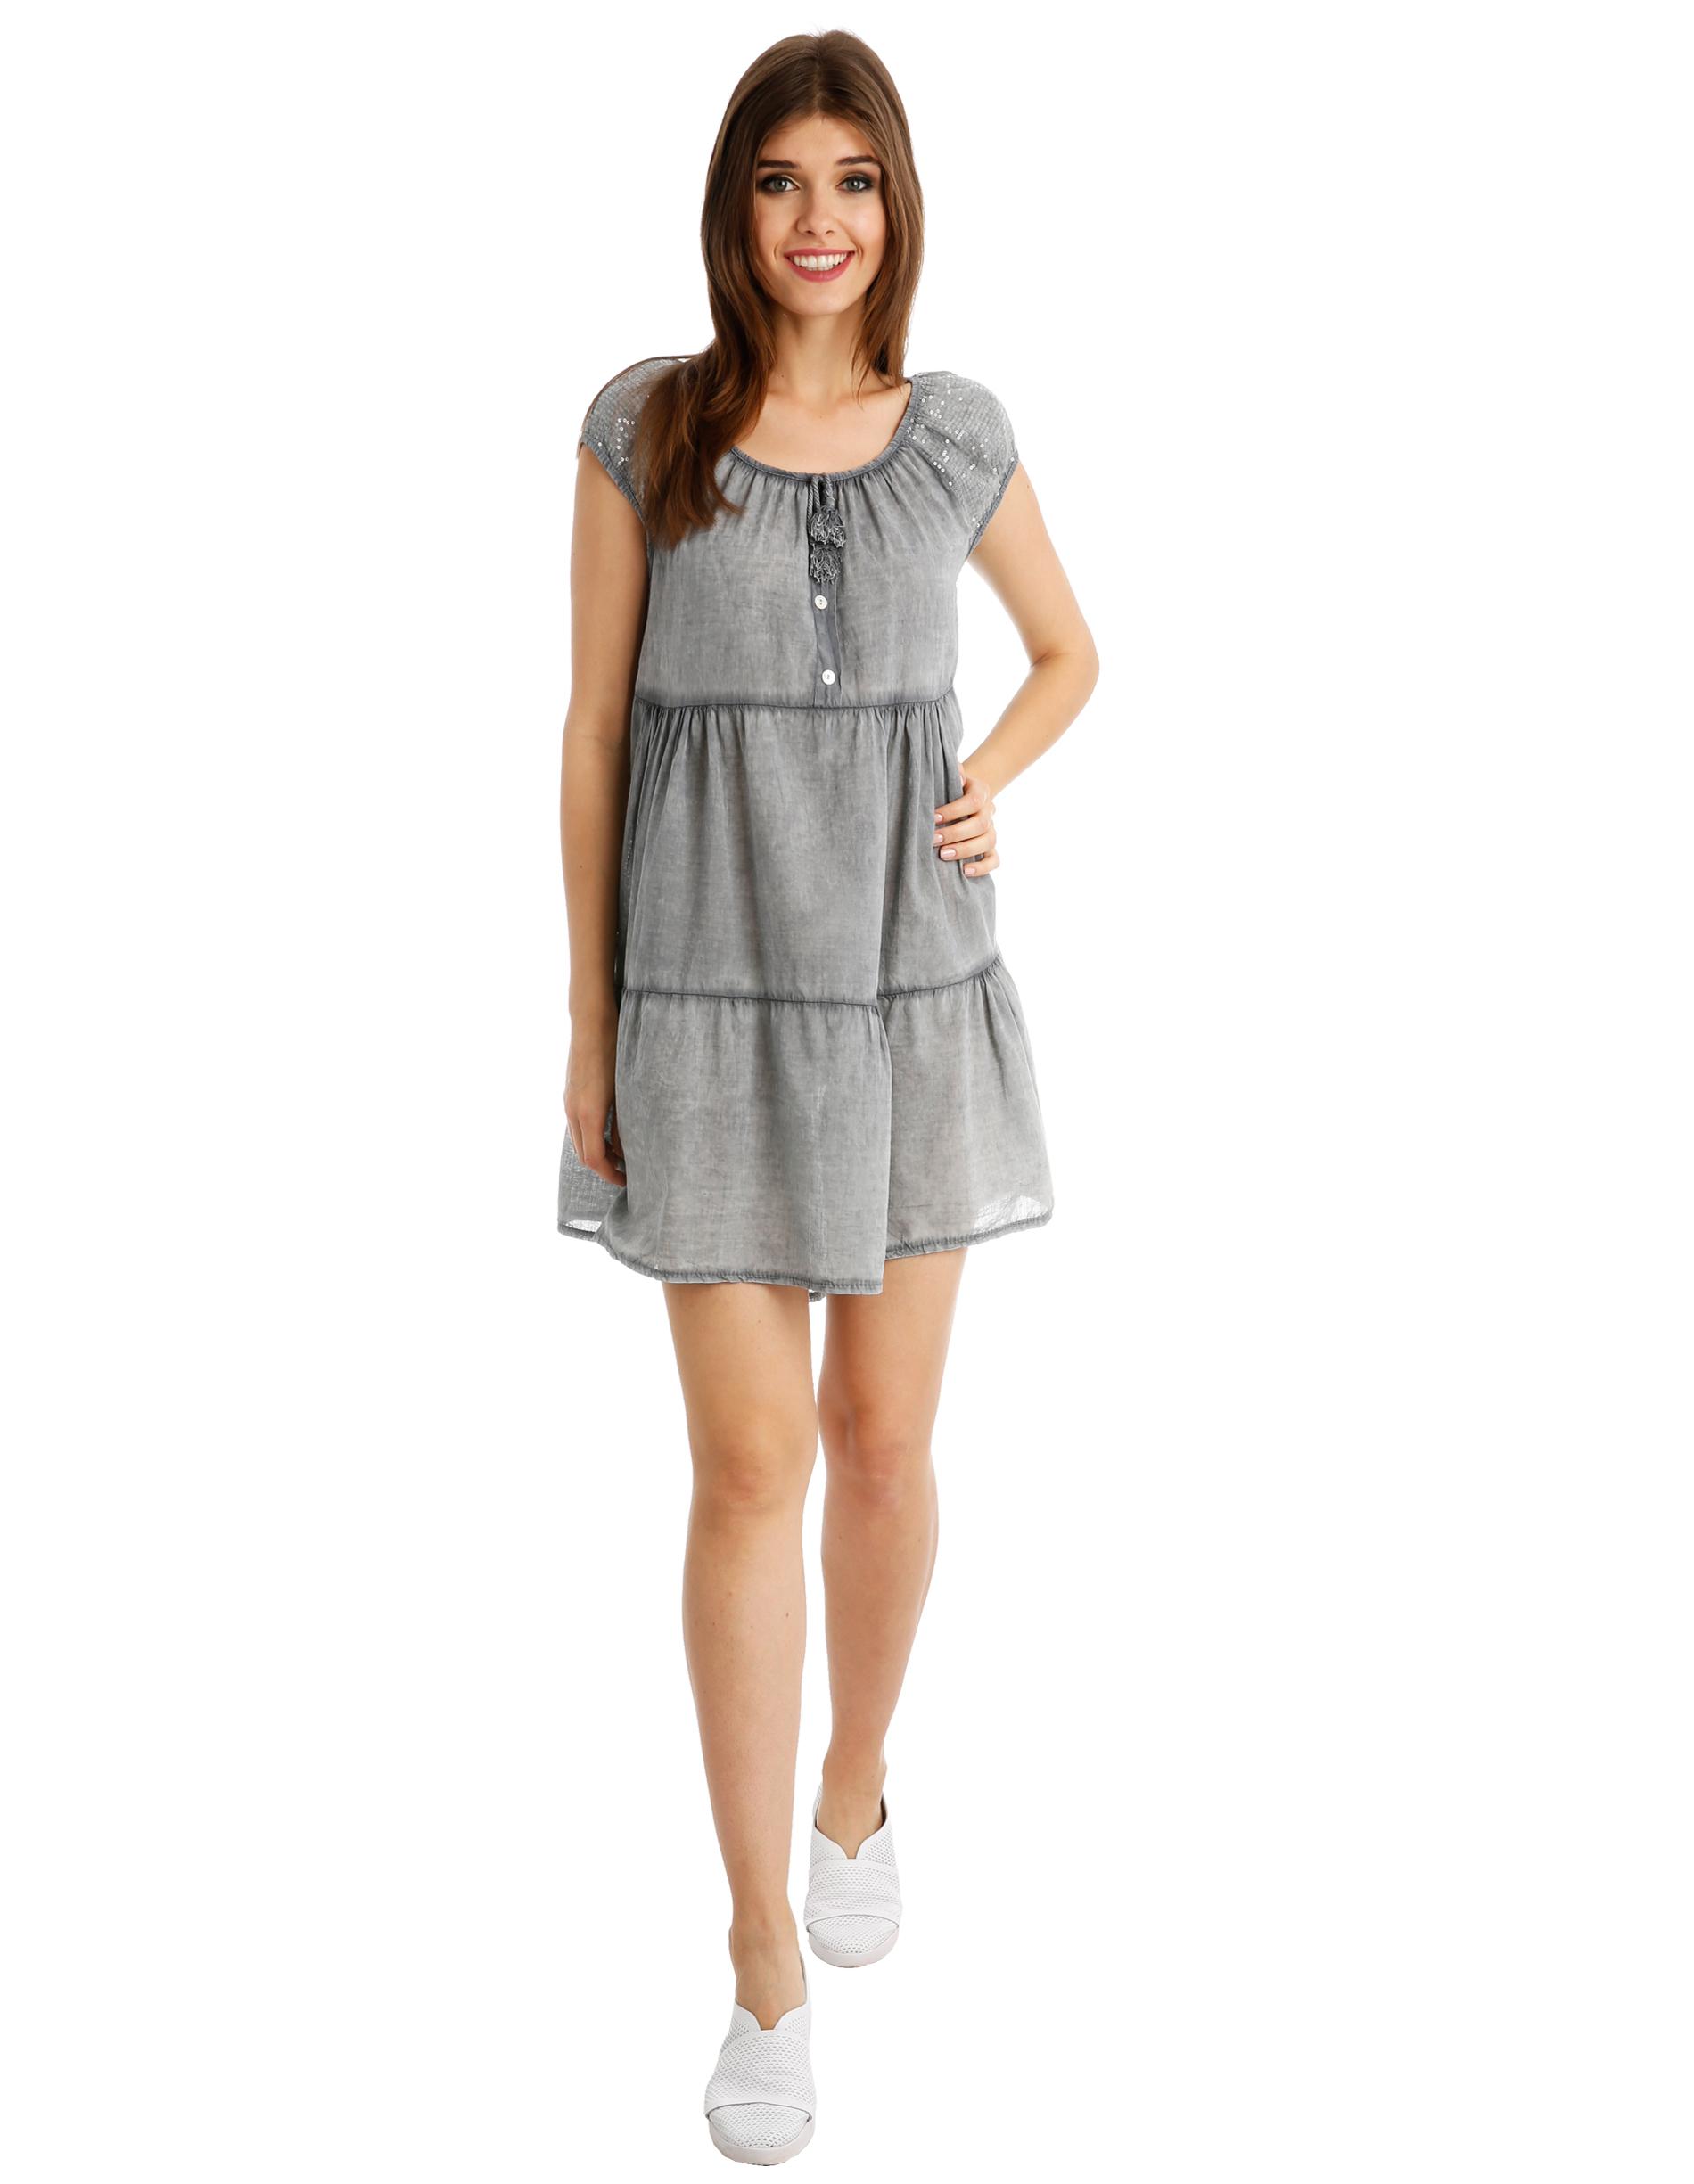 Sukienka - 106-7125 GRIG - Unisono